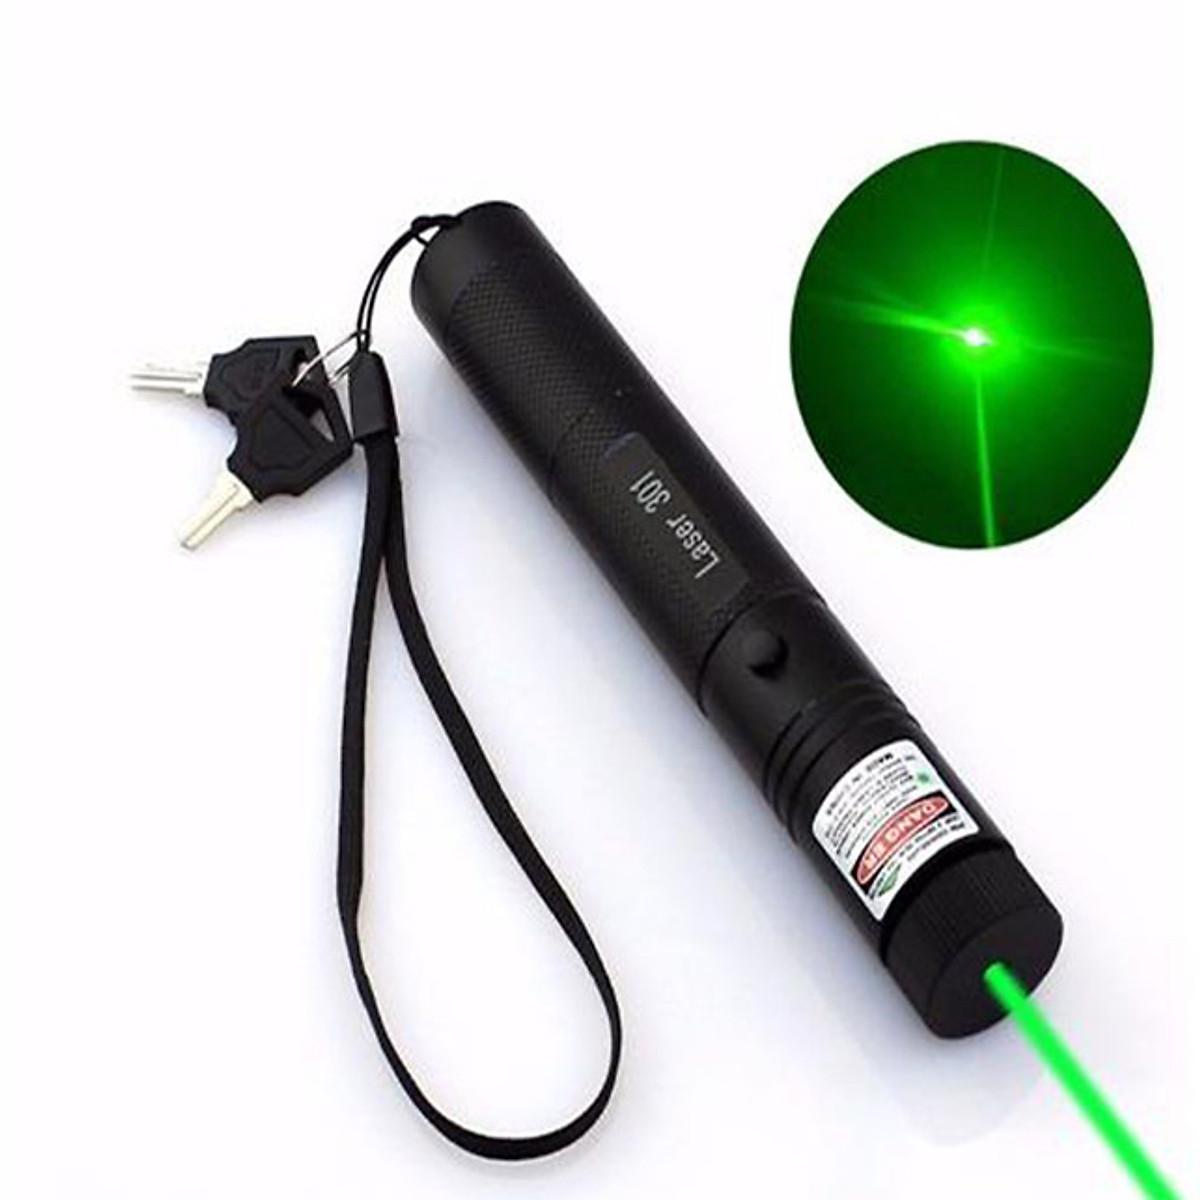 đèn pin siêu sáng Laser LASER 303